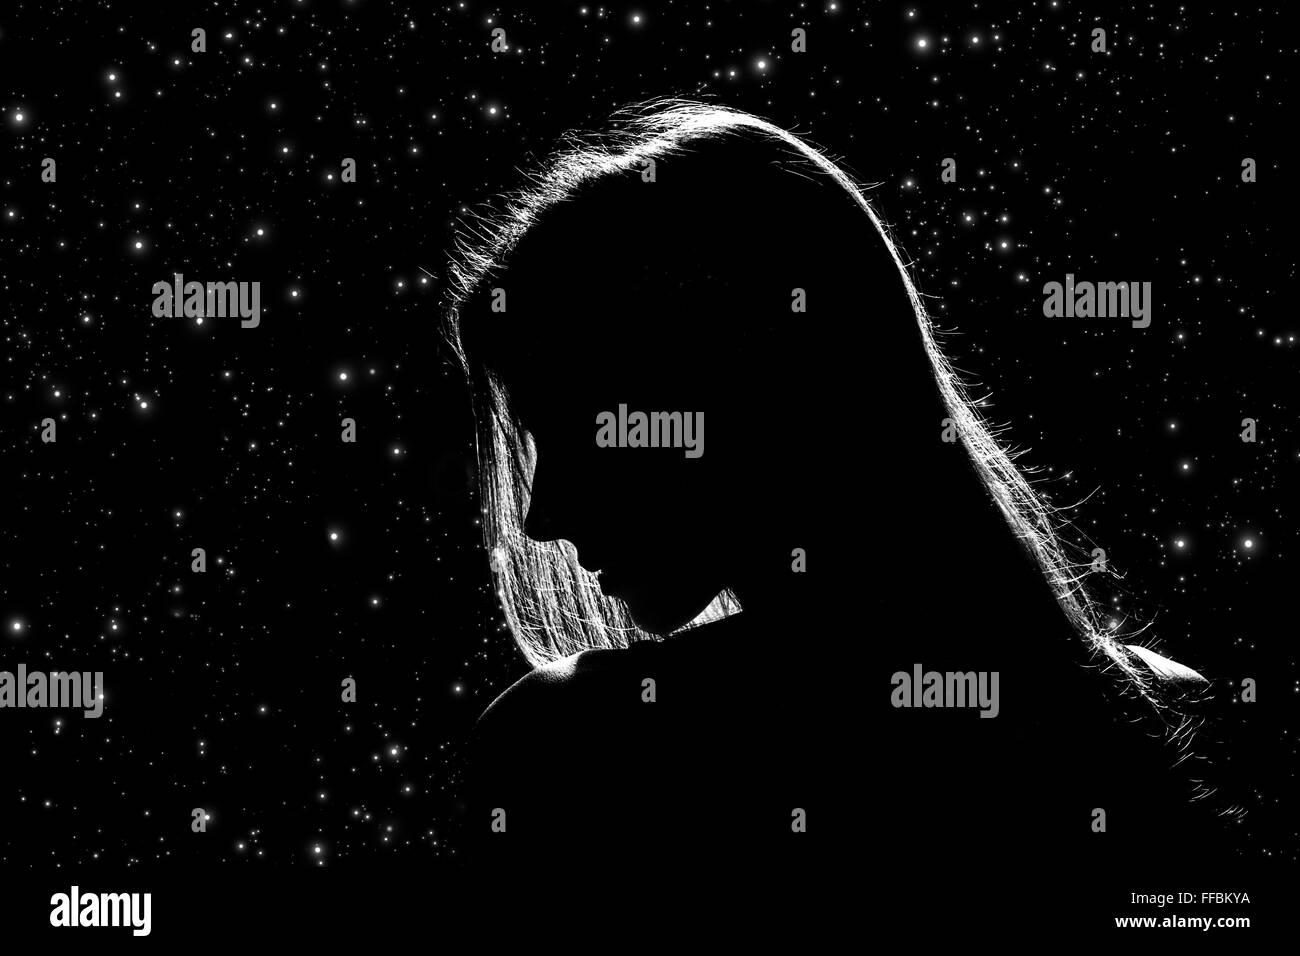 sad female profile silhouette on stars sky, monochrome image - Stock Image